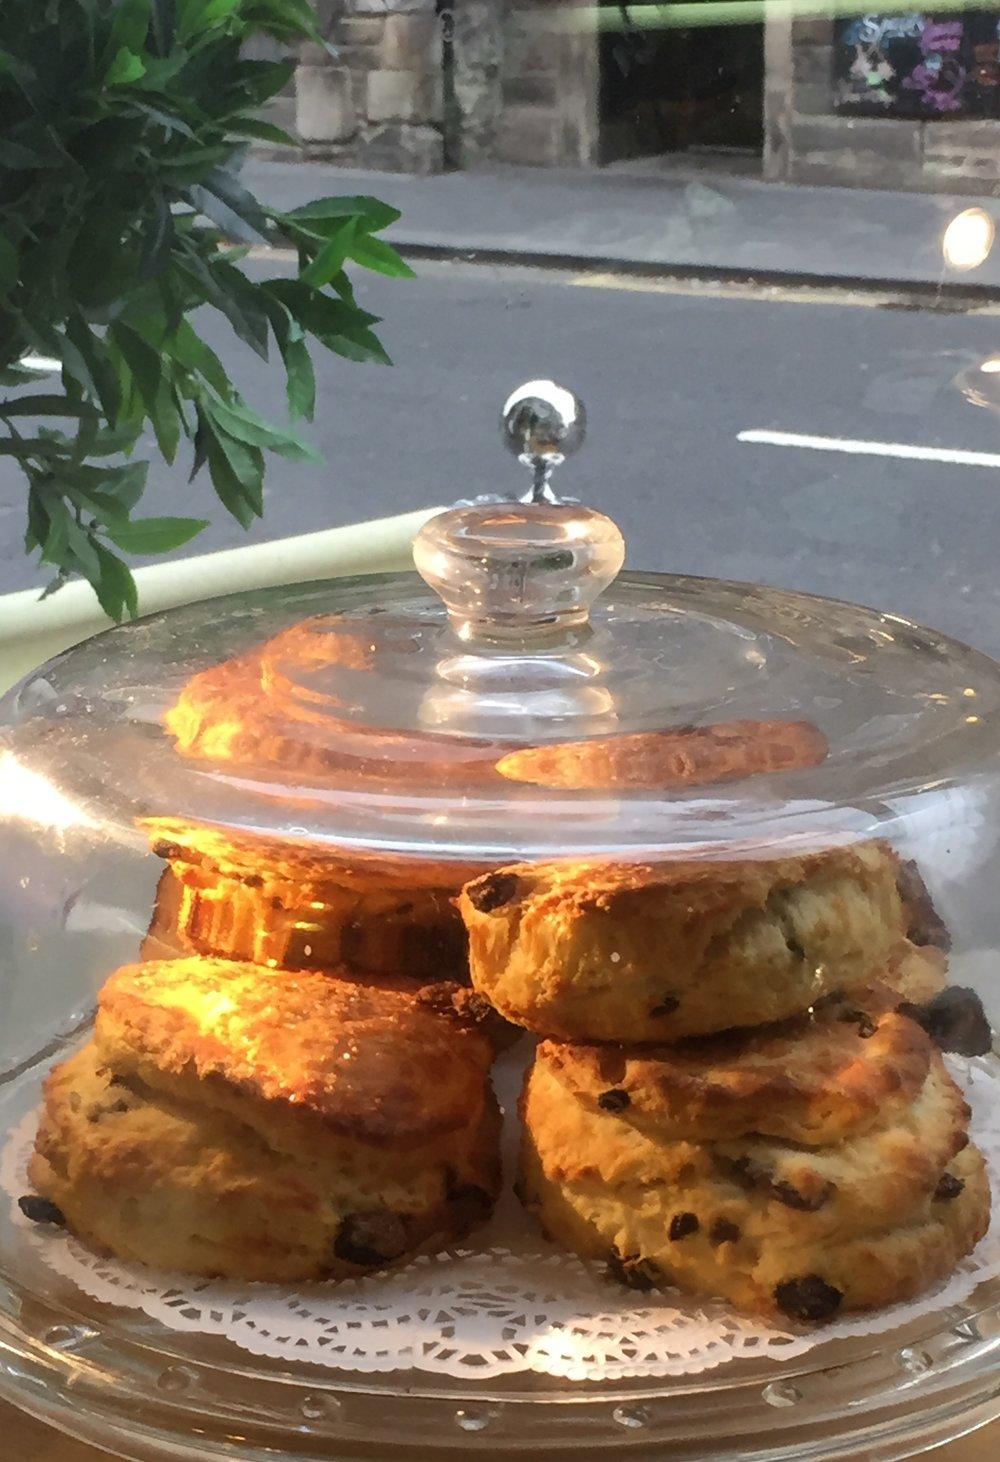 Ginger and raisin scones (2).JPG